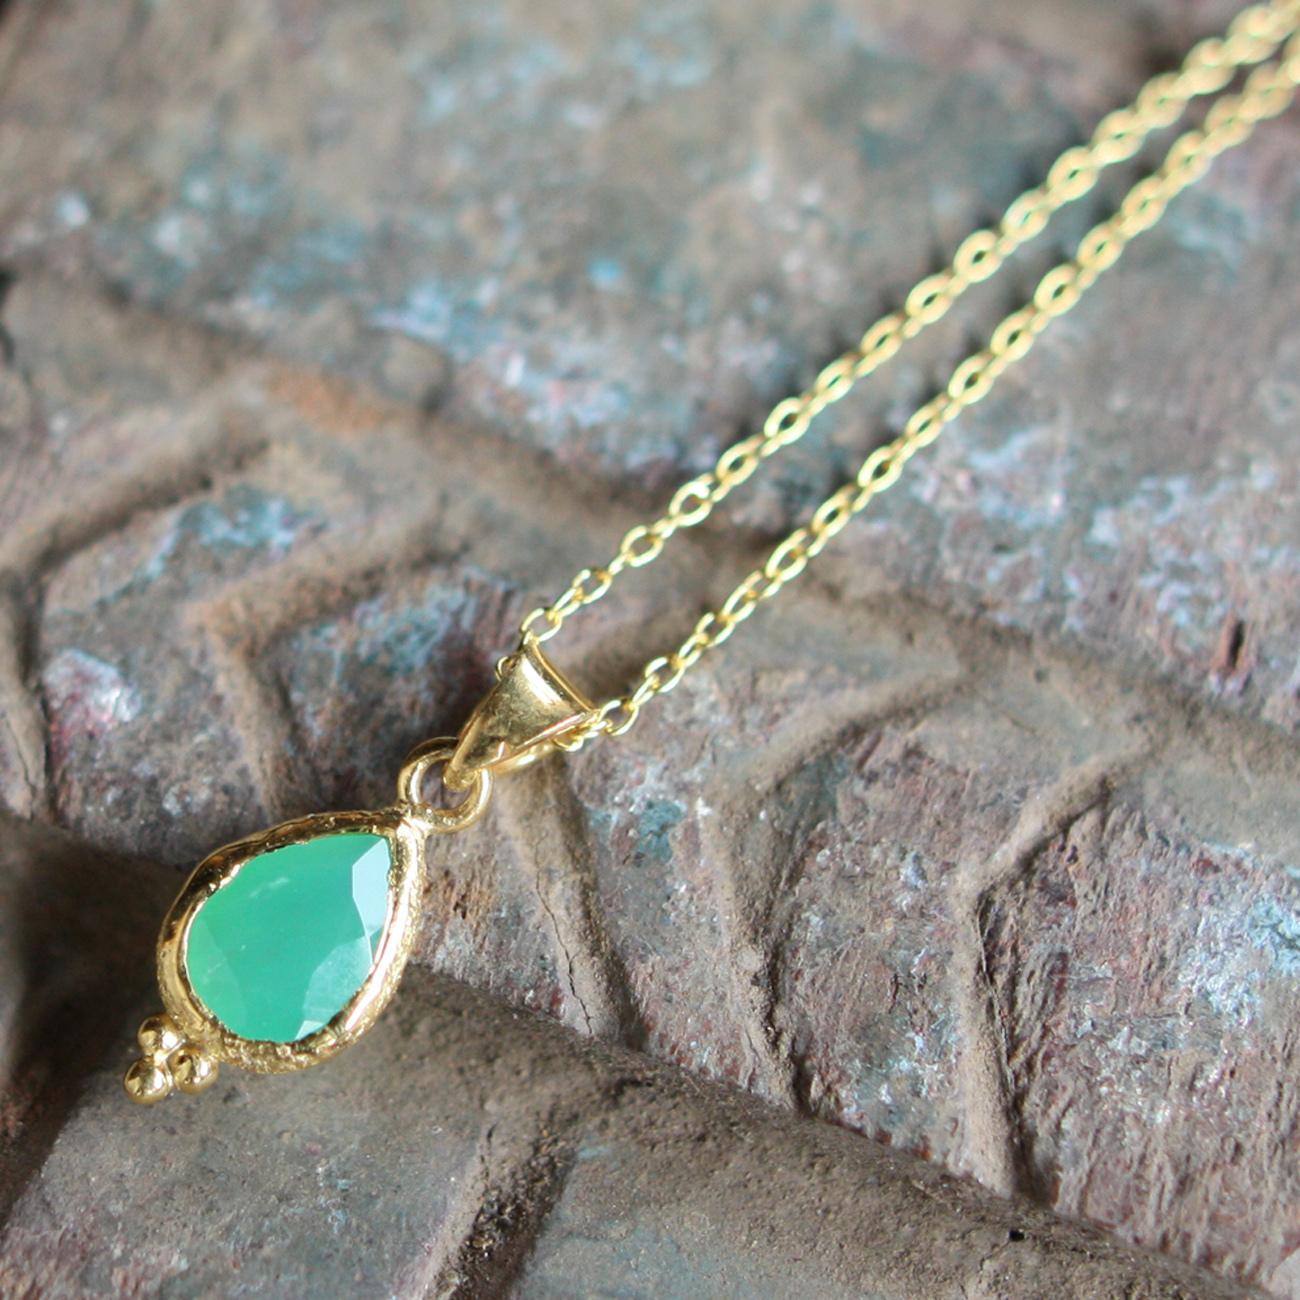 Jaipur gem ネックレス -emerald-